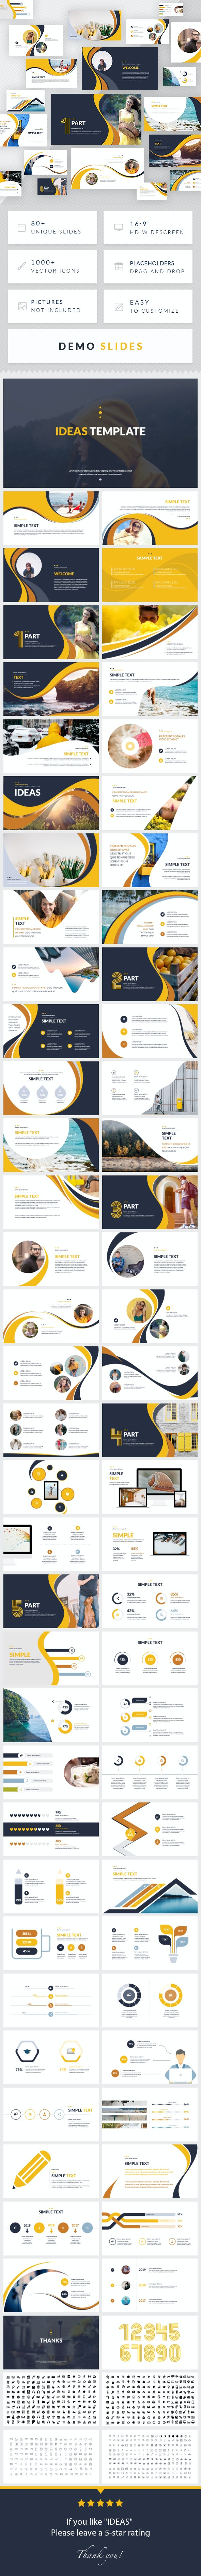 Ideas - Creative Keynote Presentation Template - Business Keynote Templates